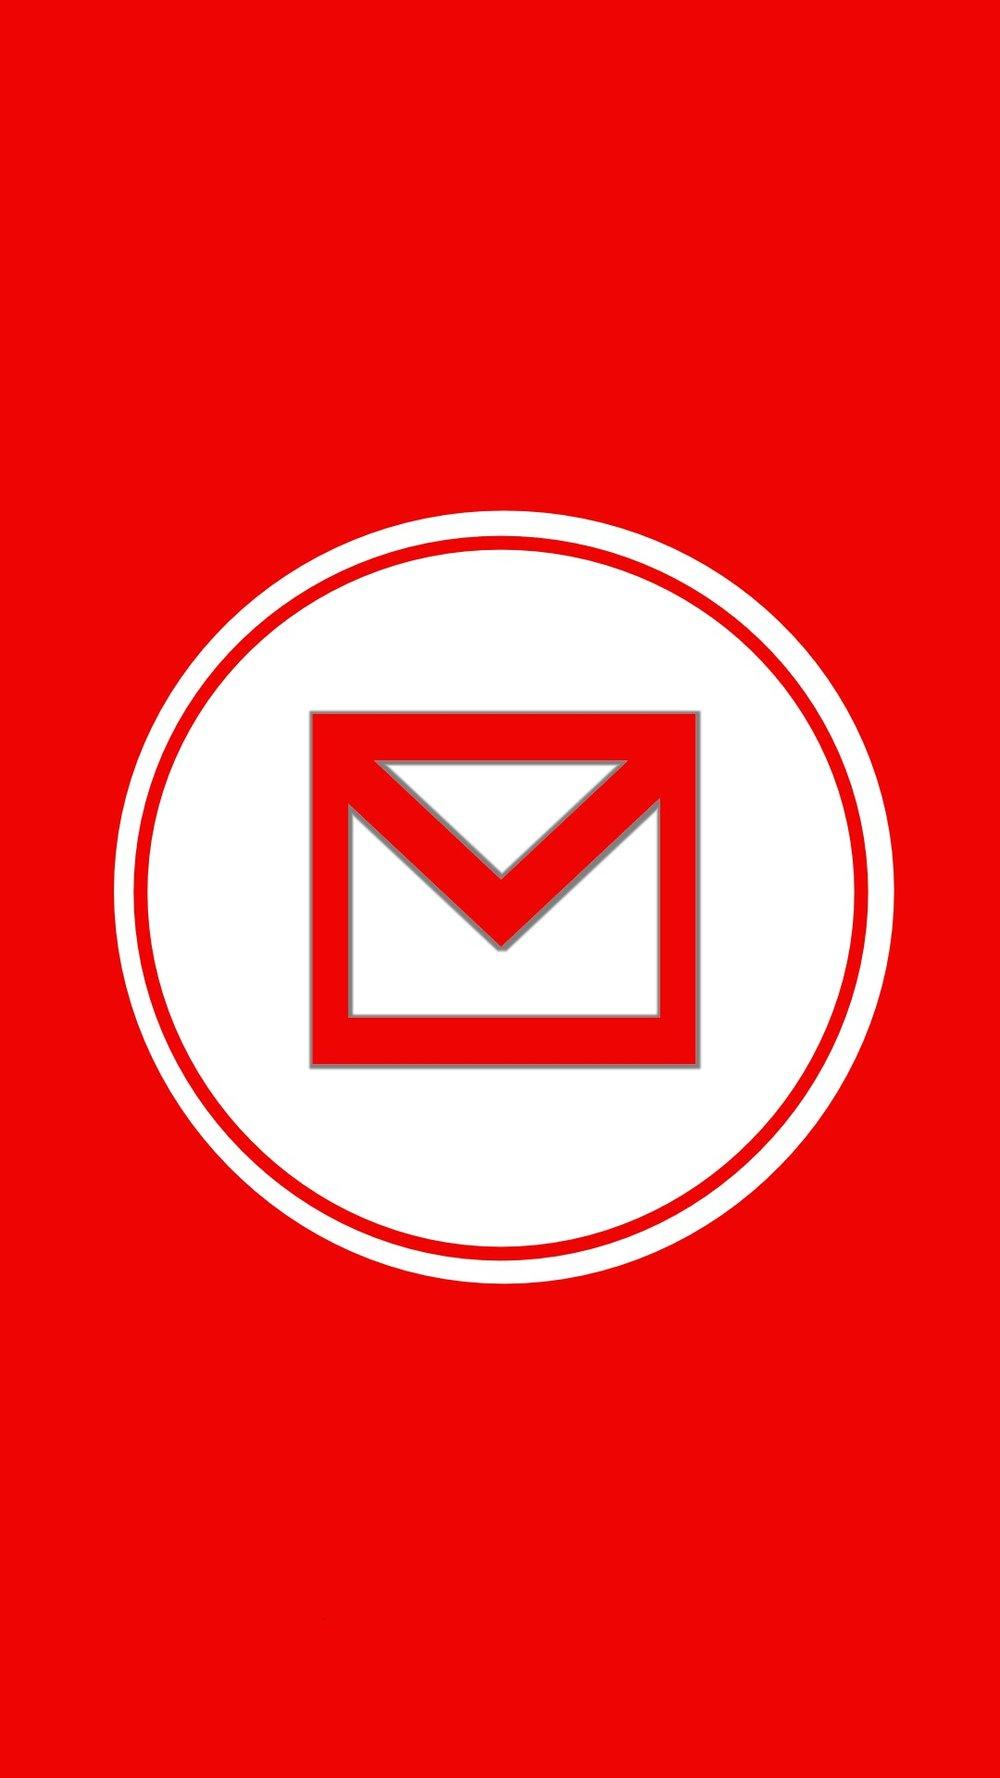 Instagram-cover-envelope-red-lotnotes.com.jpg